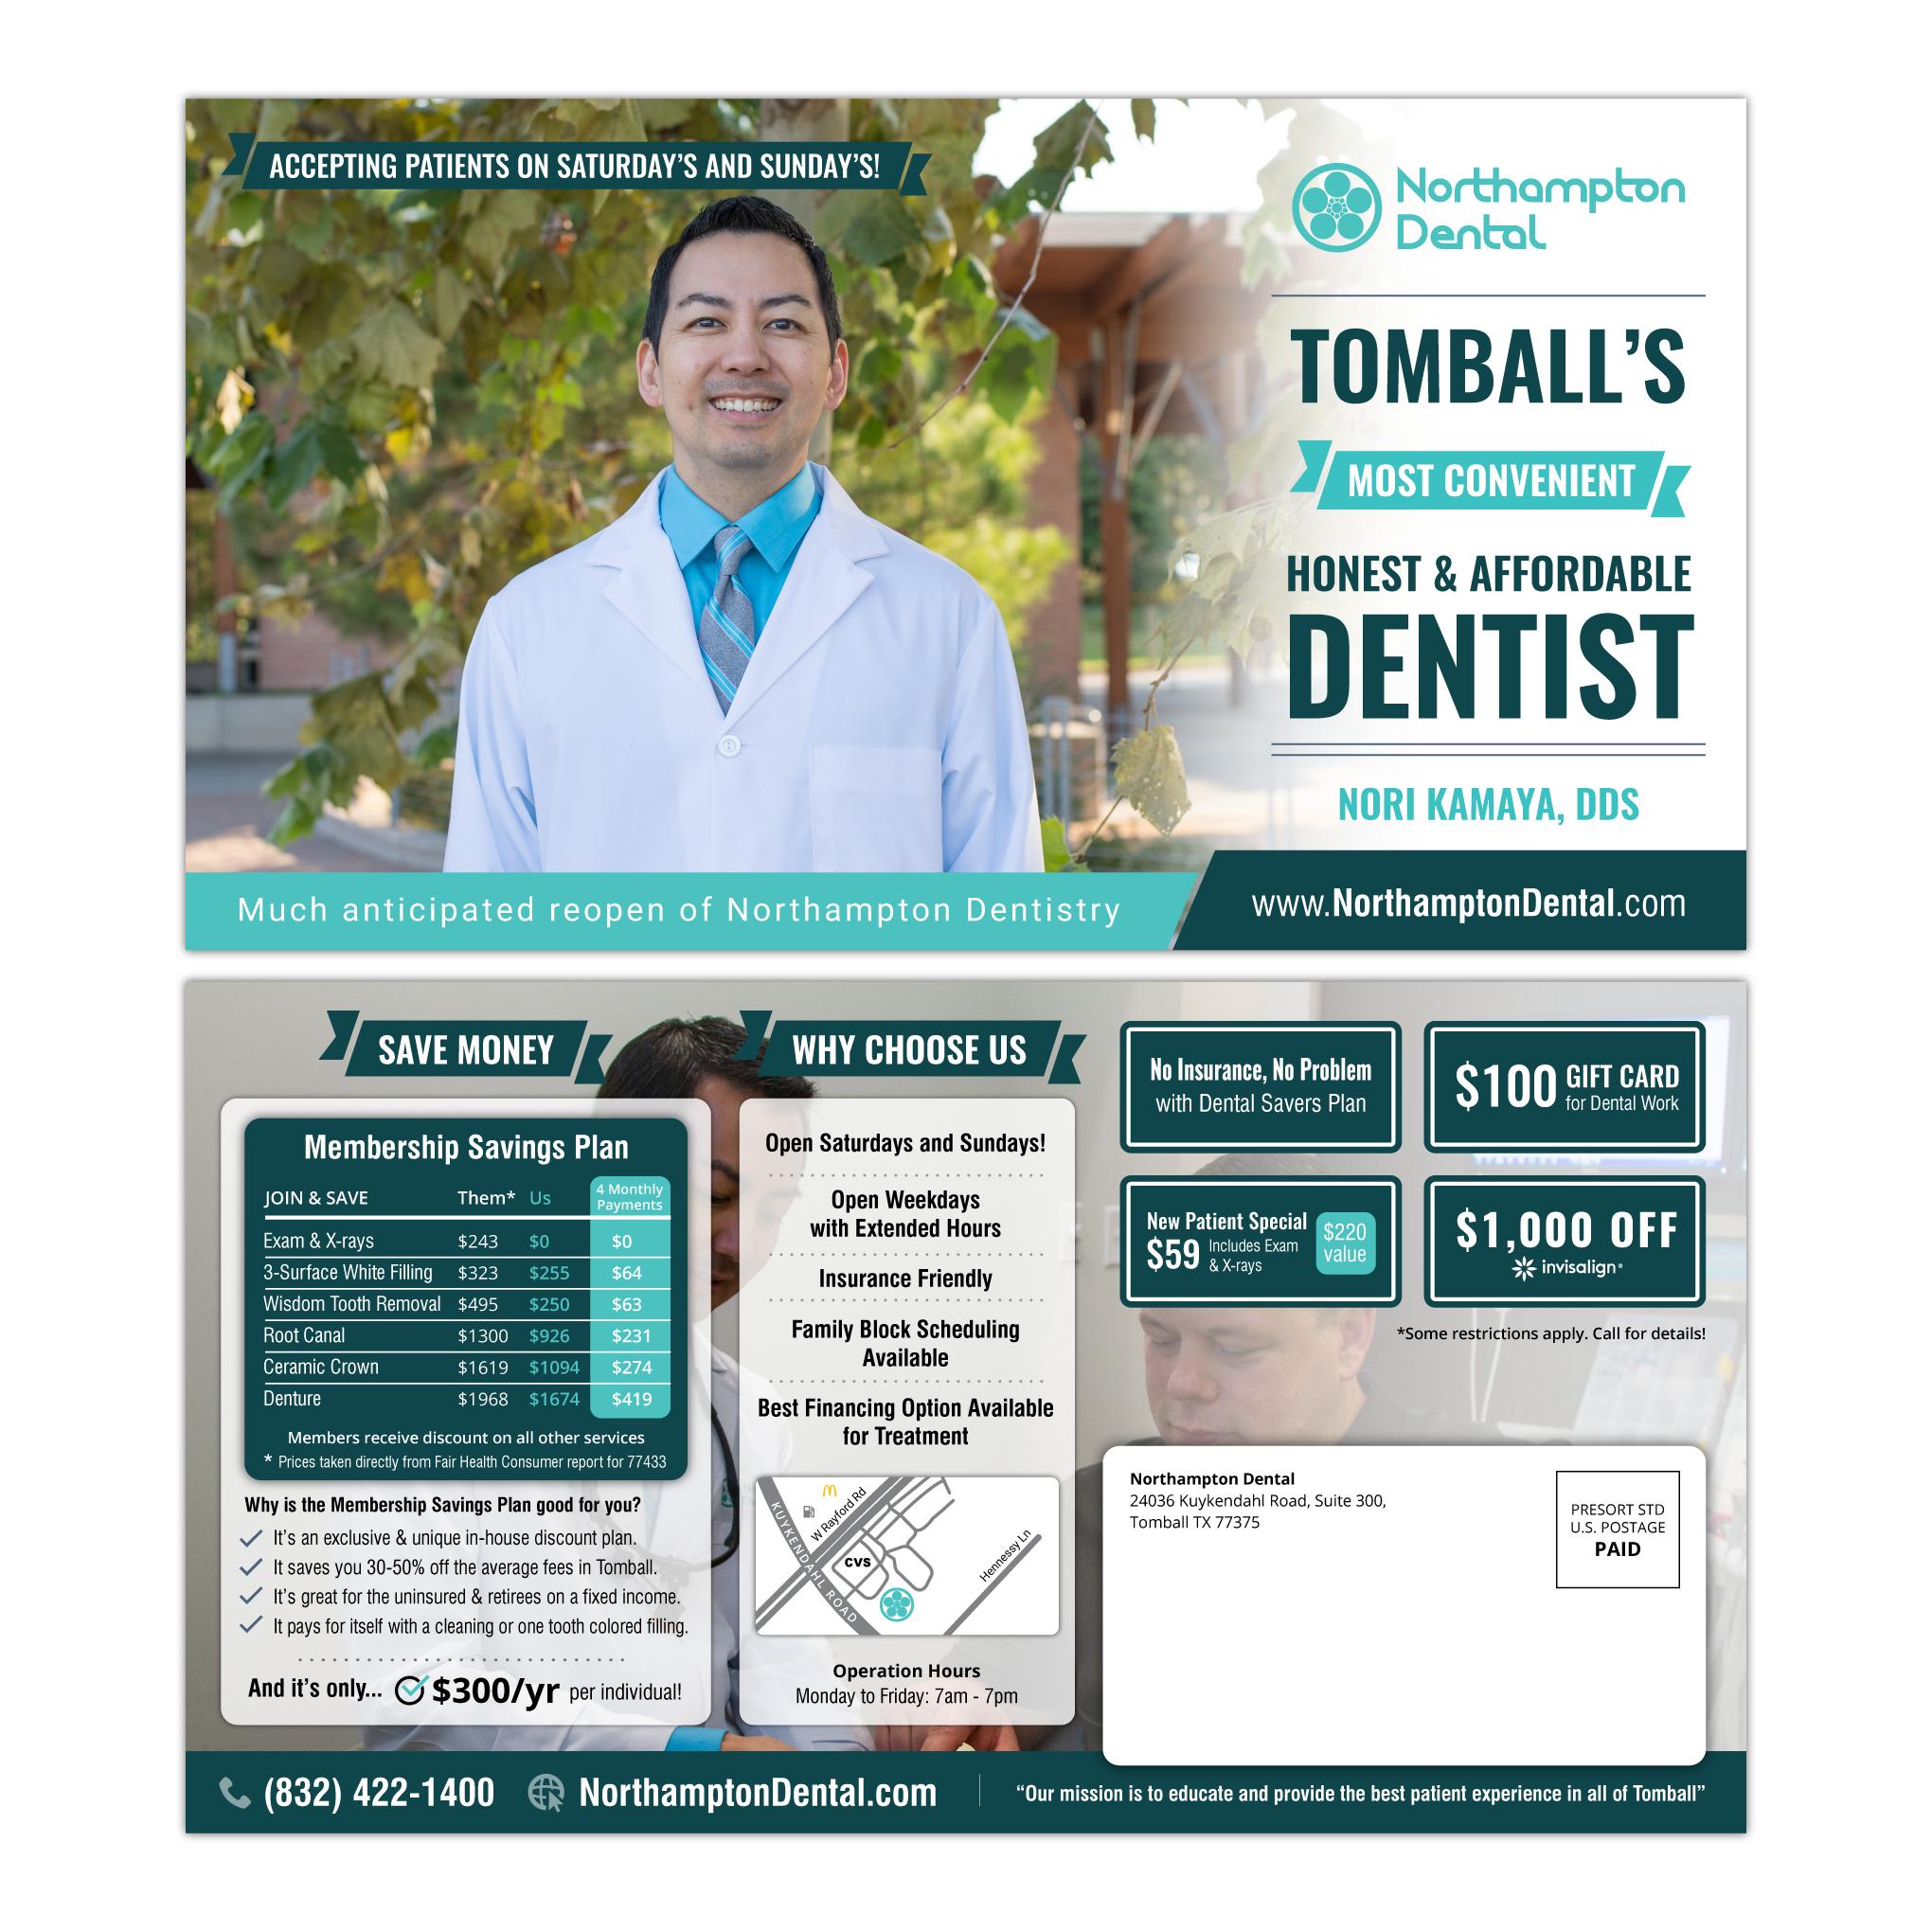 Northampton Dental